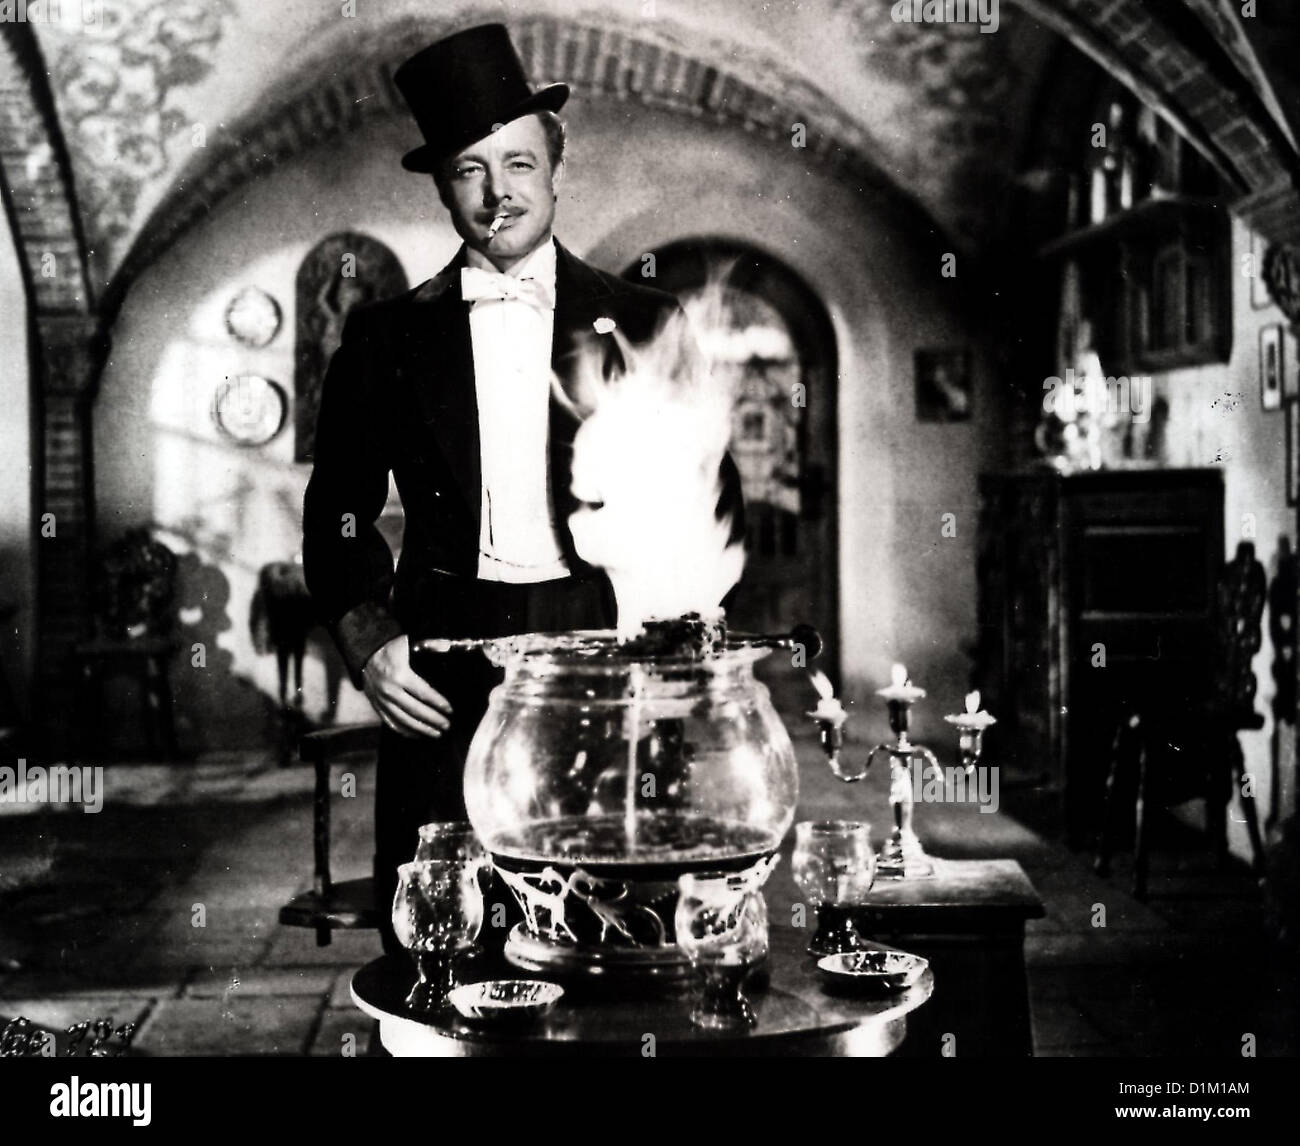 Die Feuerzangenbowle Heinz Rühmann